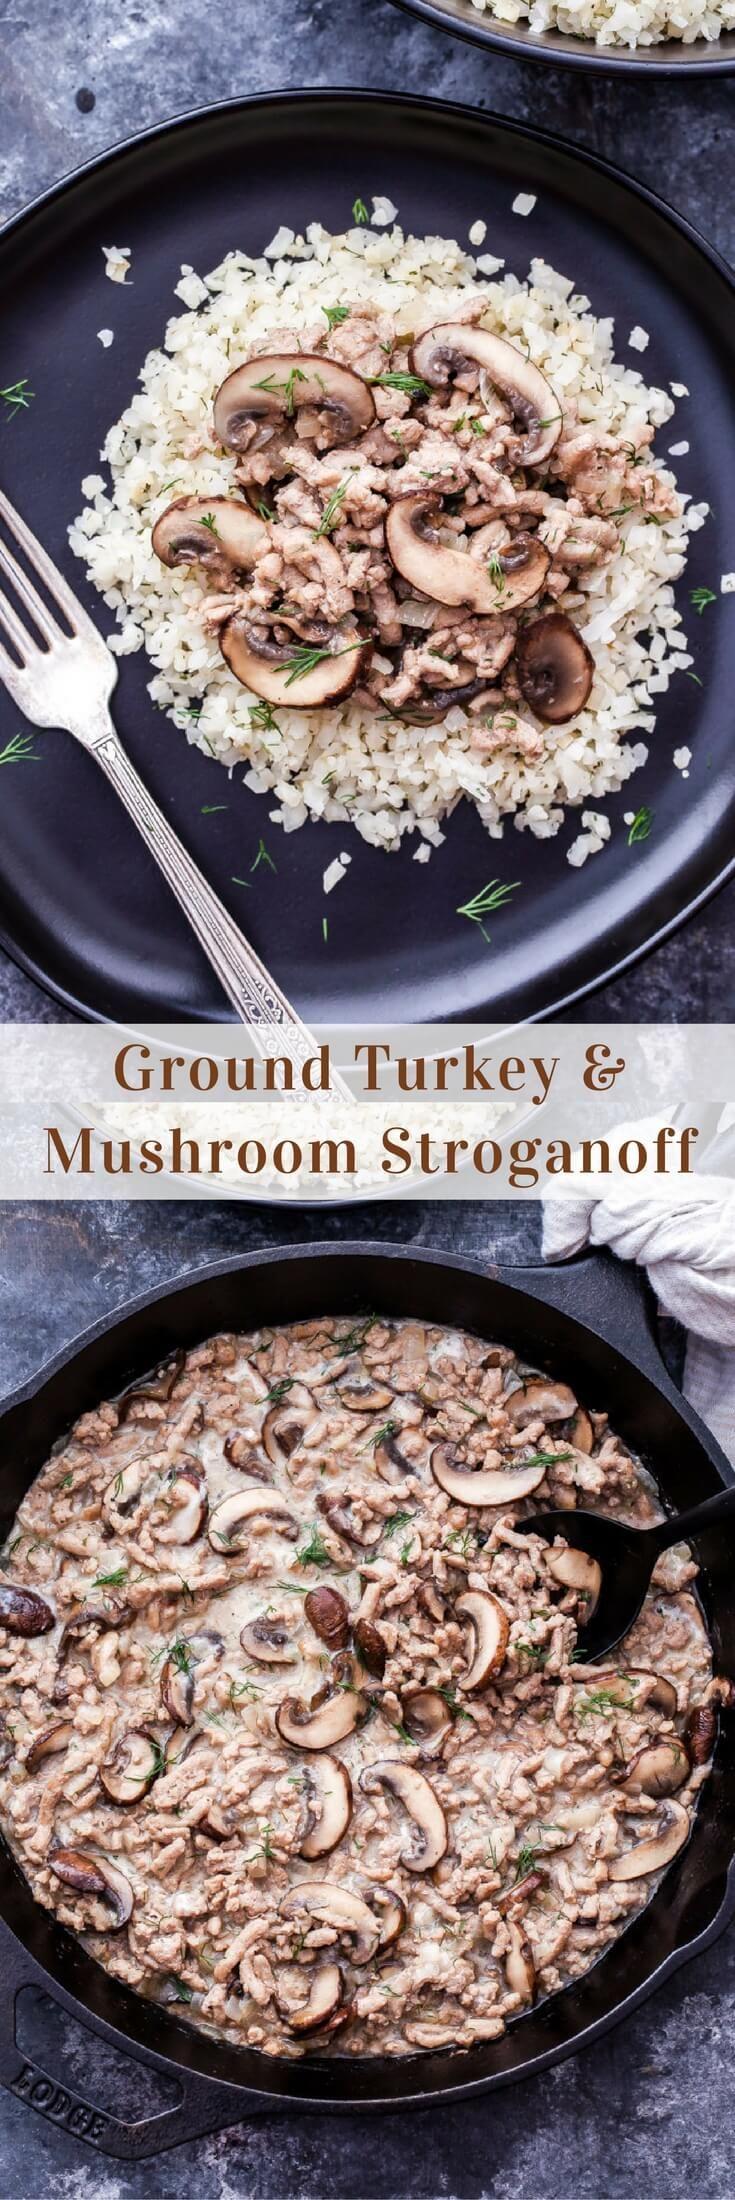 Ground Turkey and Mushroom Stroganoff - Recipe Runner